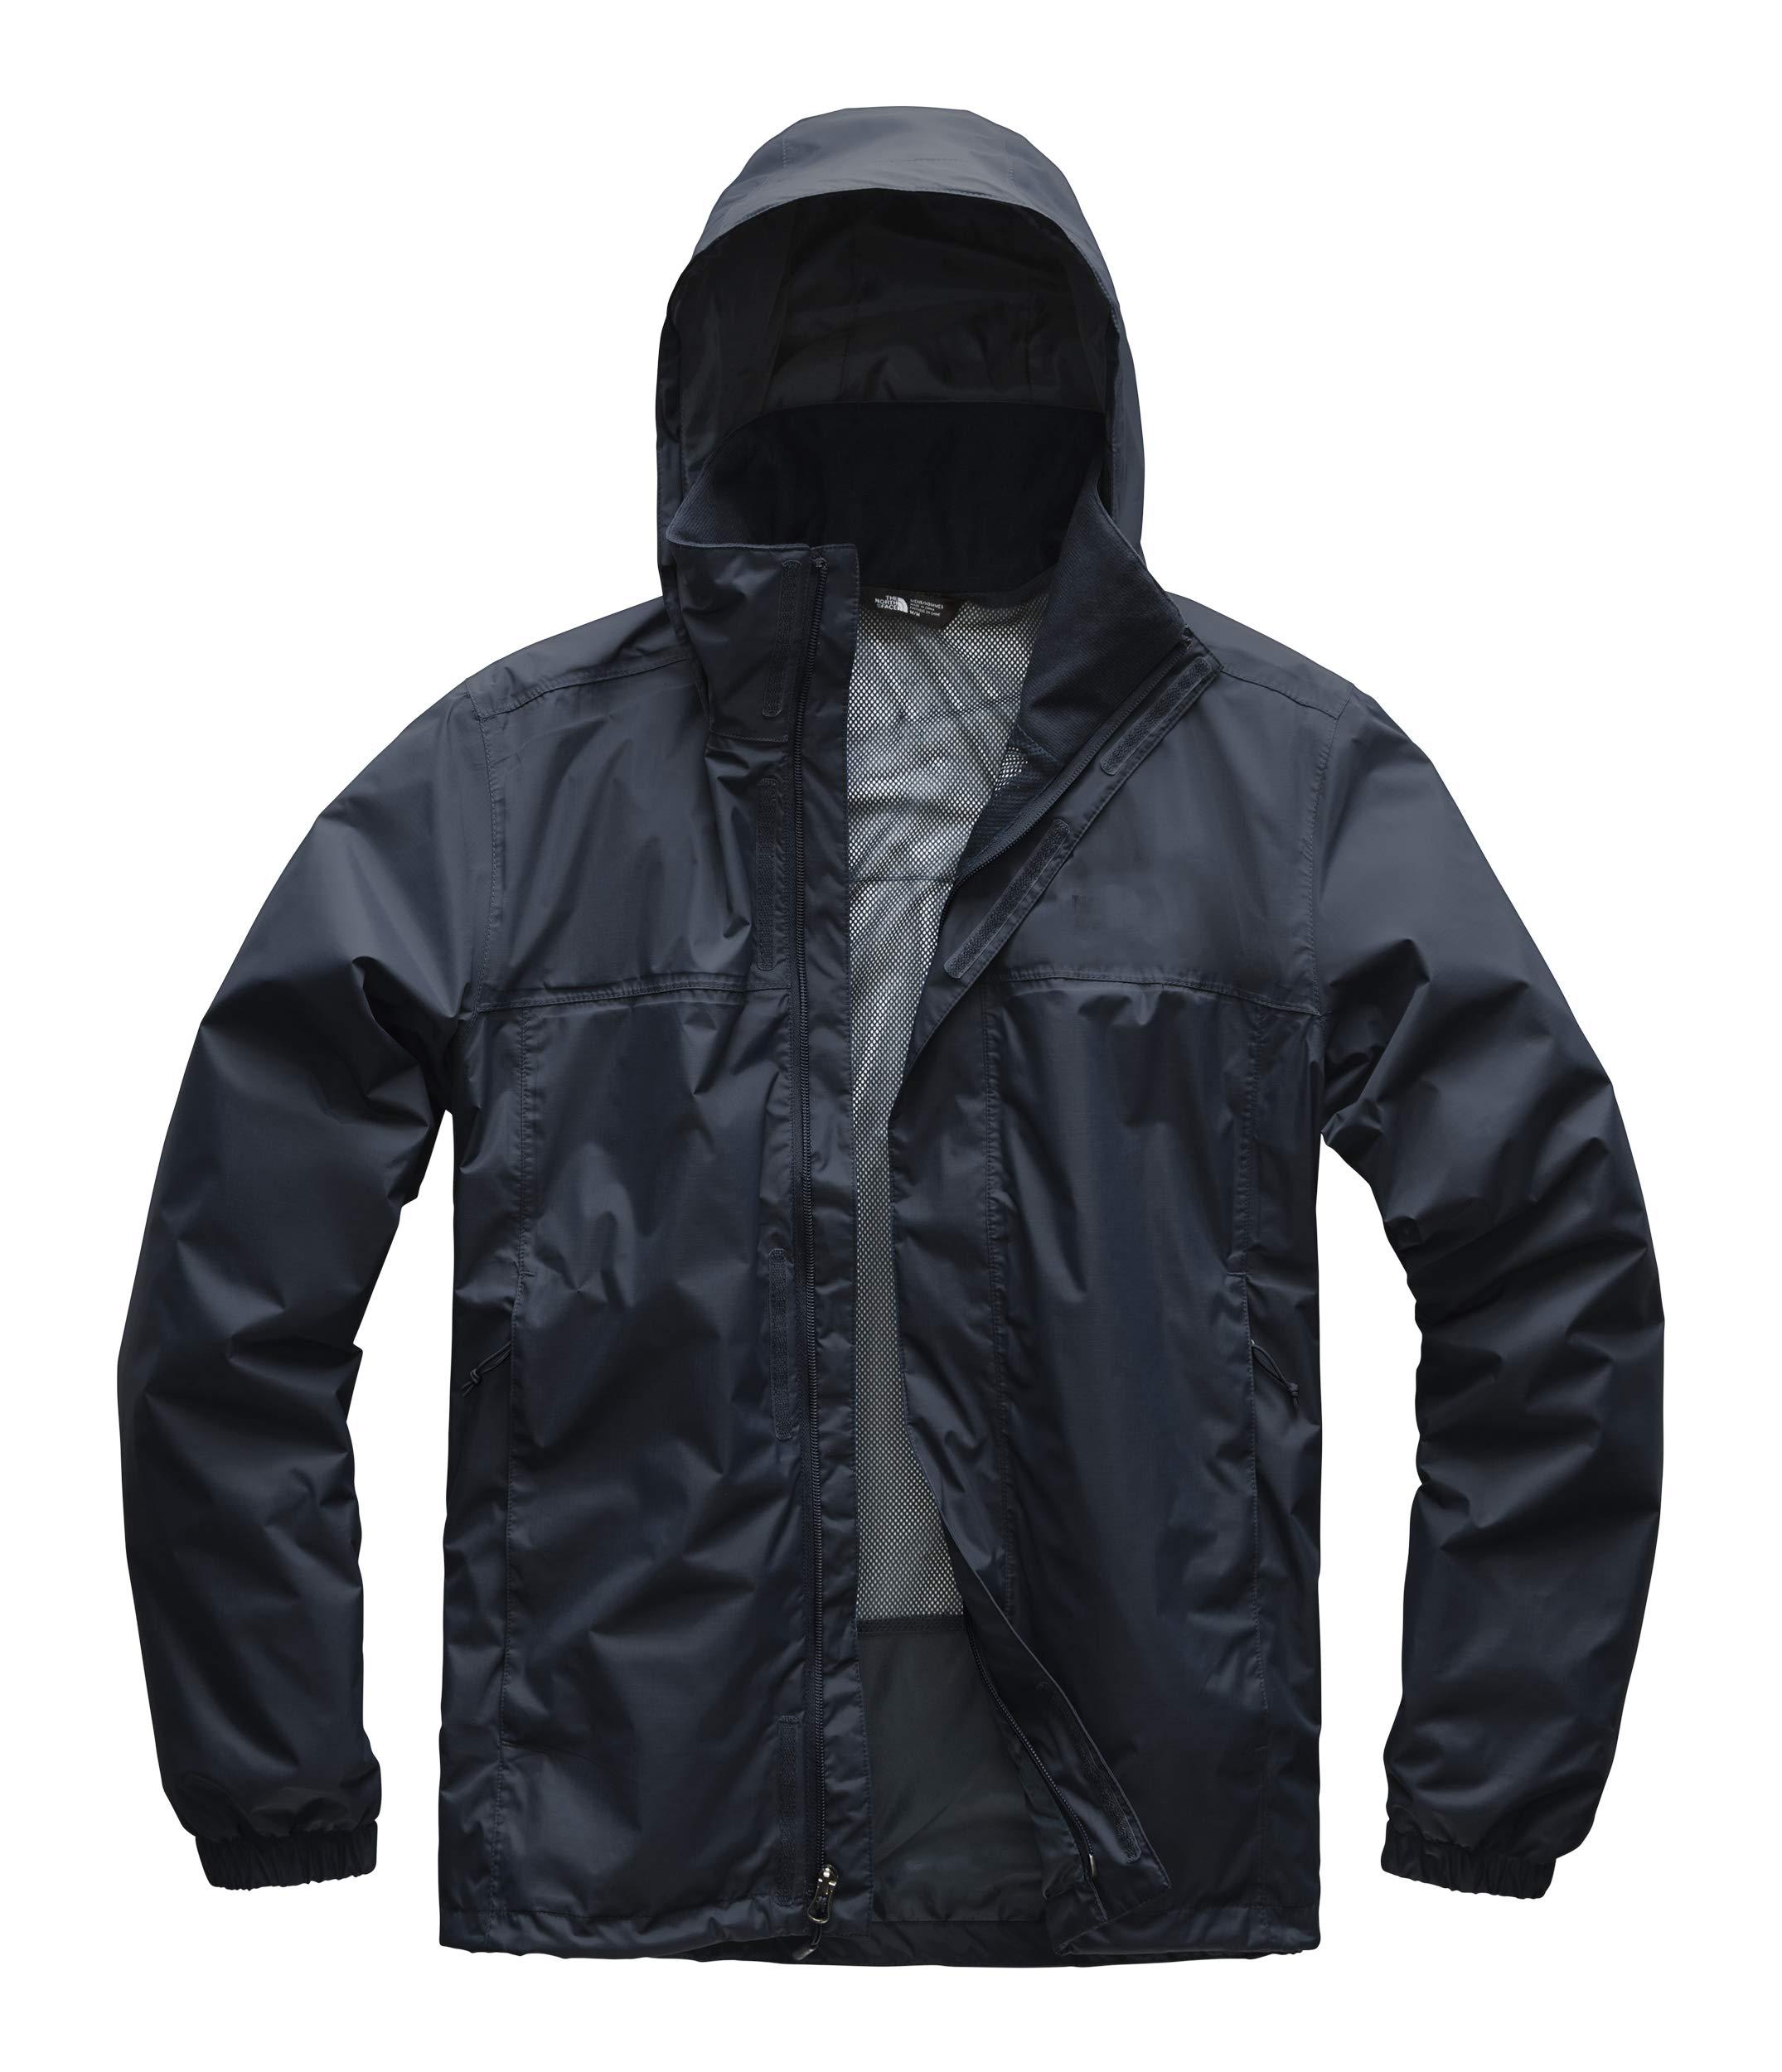 The North Face Men's Resolve 2 Jacket, Urban Navy/Mid Grey, Small